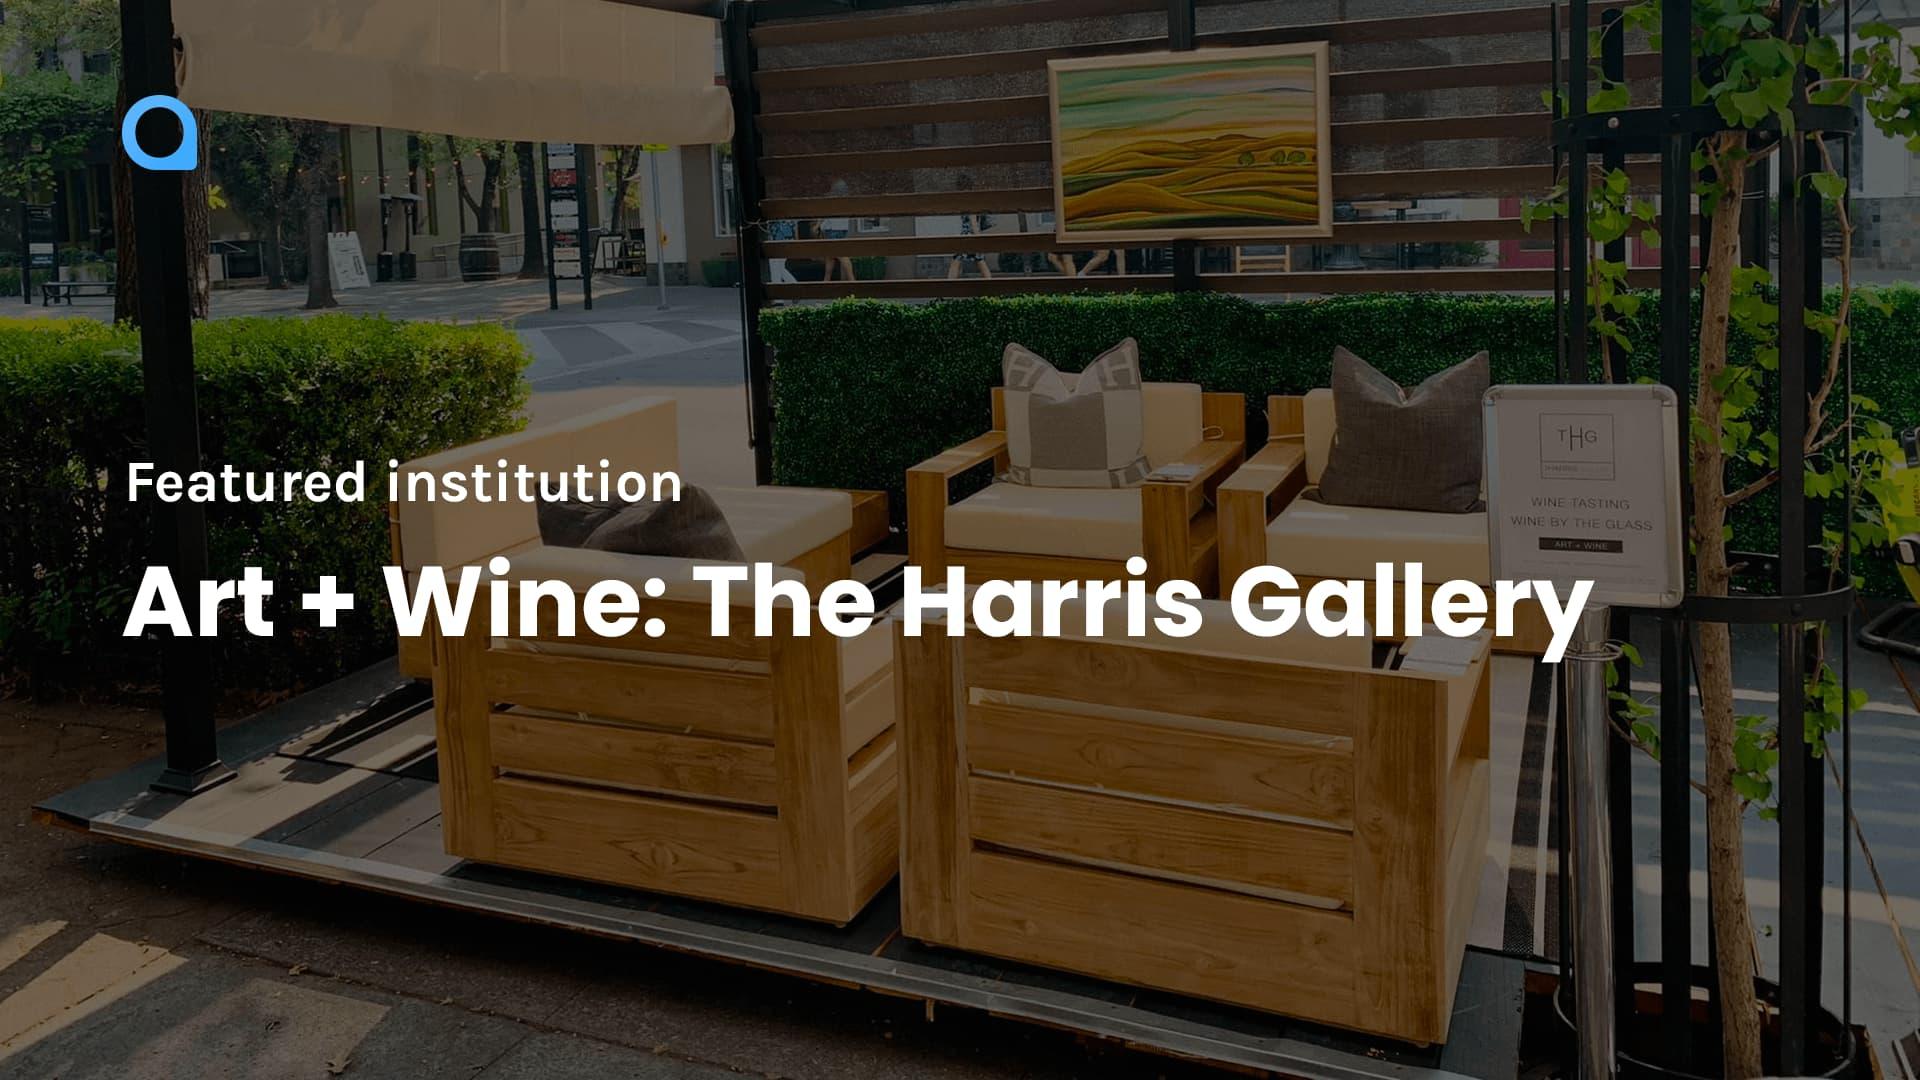 Art + Wine: The Harris Gallery